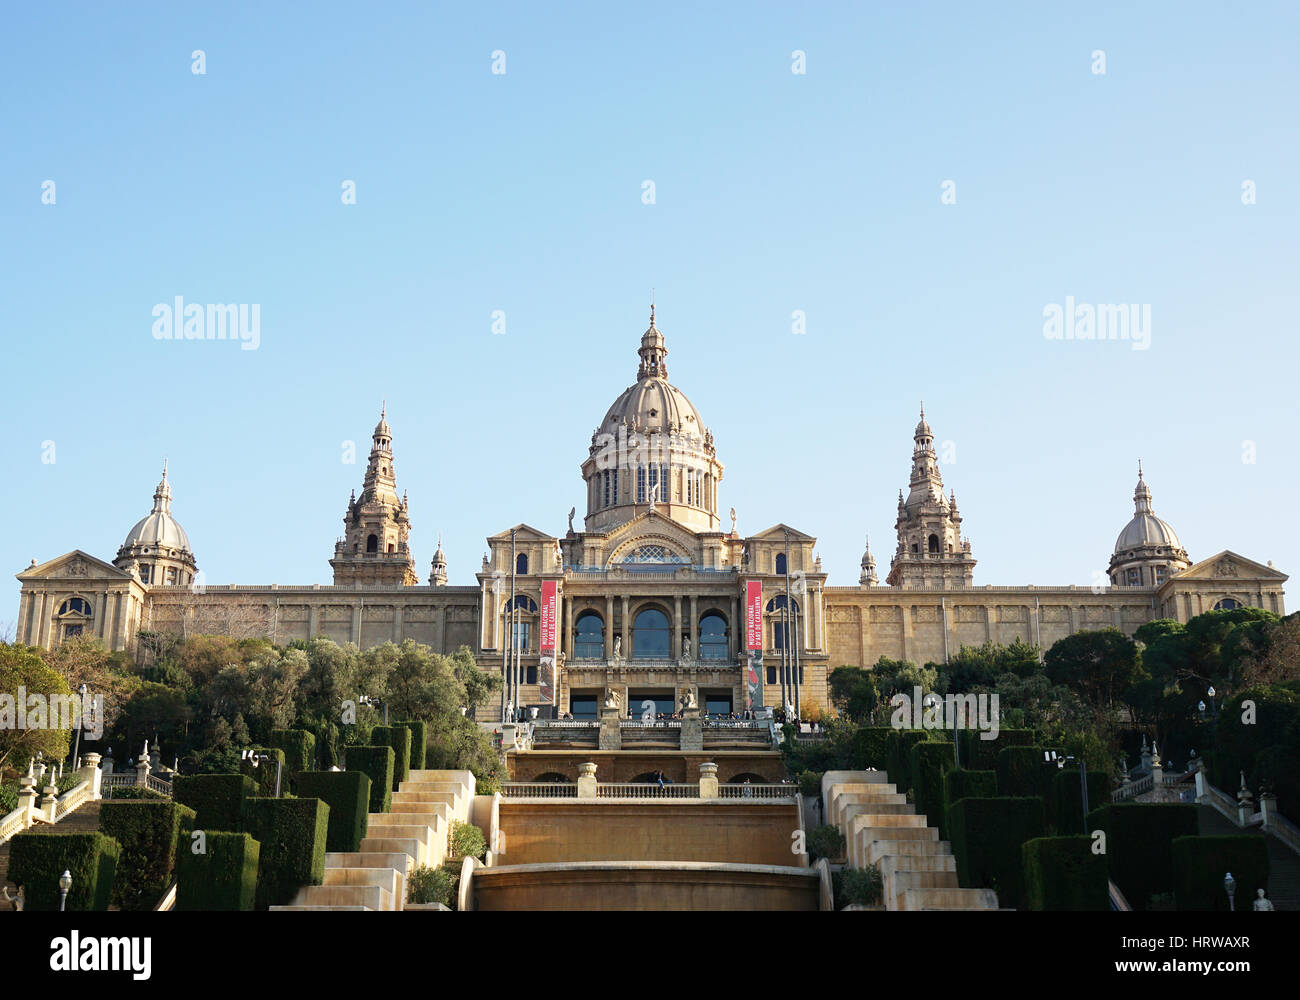 Barcelone, Espagne - 29 févr., 2016: Palau Nacional (Palais National) abrite aujourd'hui le Museu Photo Stock